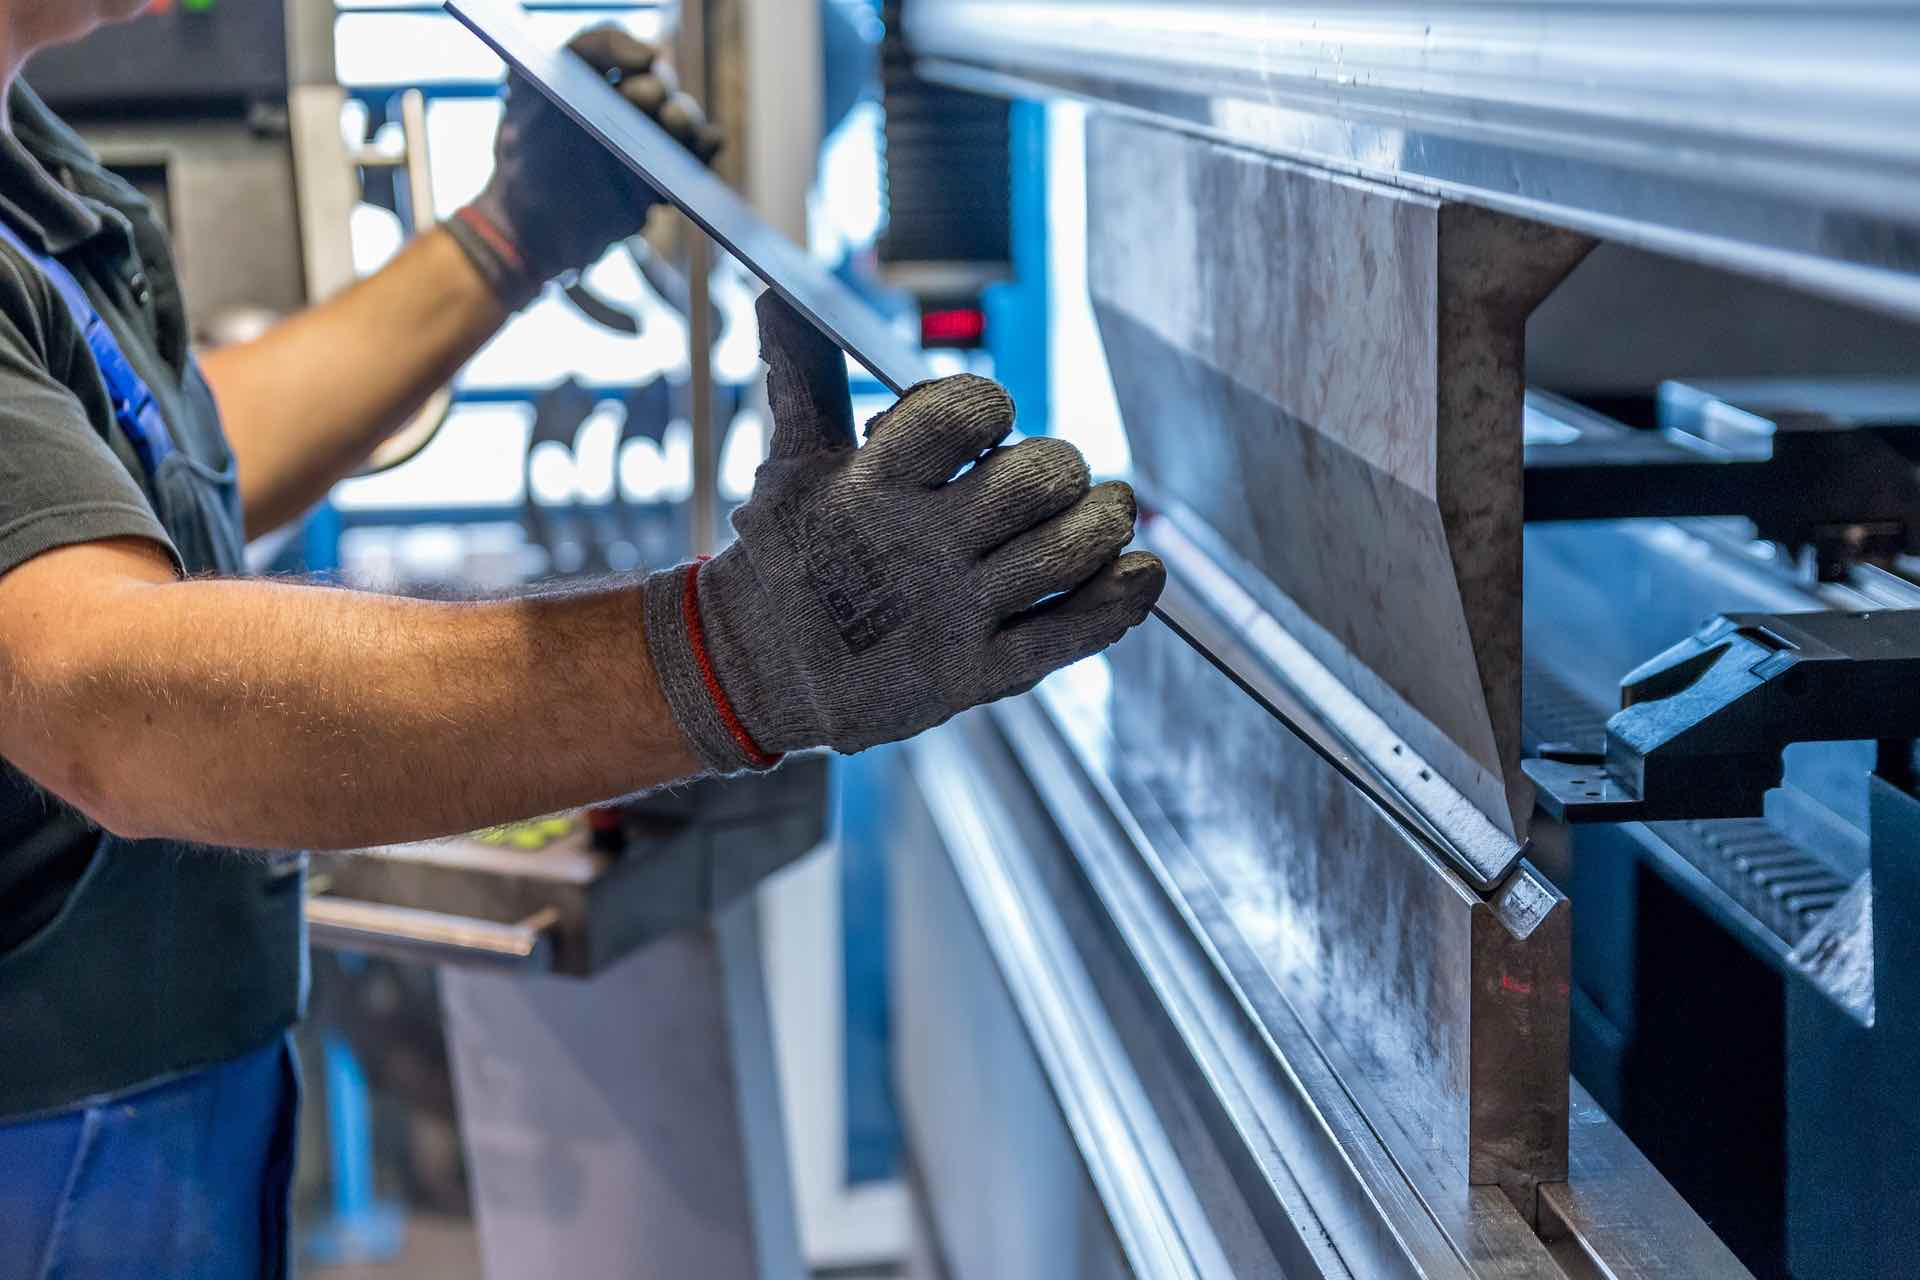 Indramat Bosch Rexroth Repair Service: USA: MIS